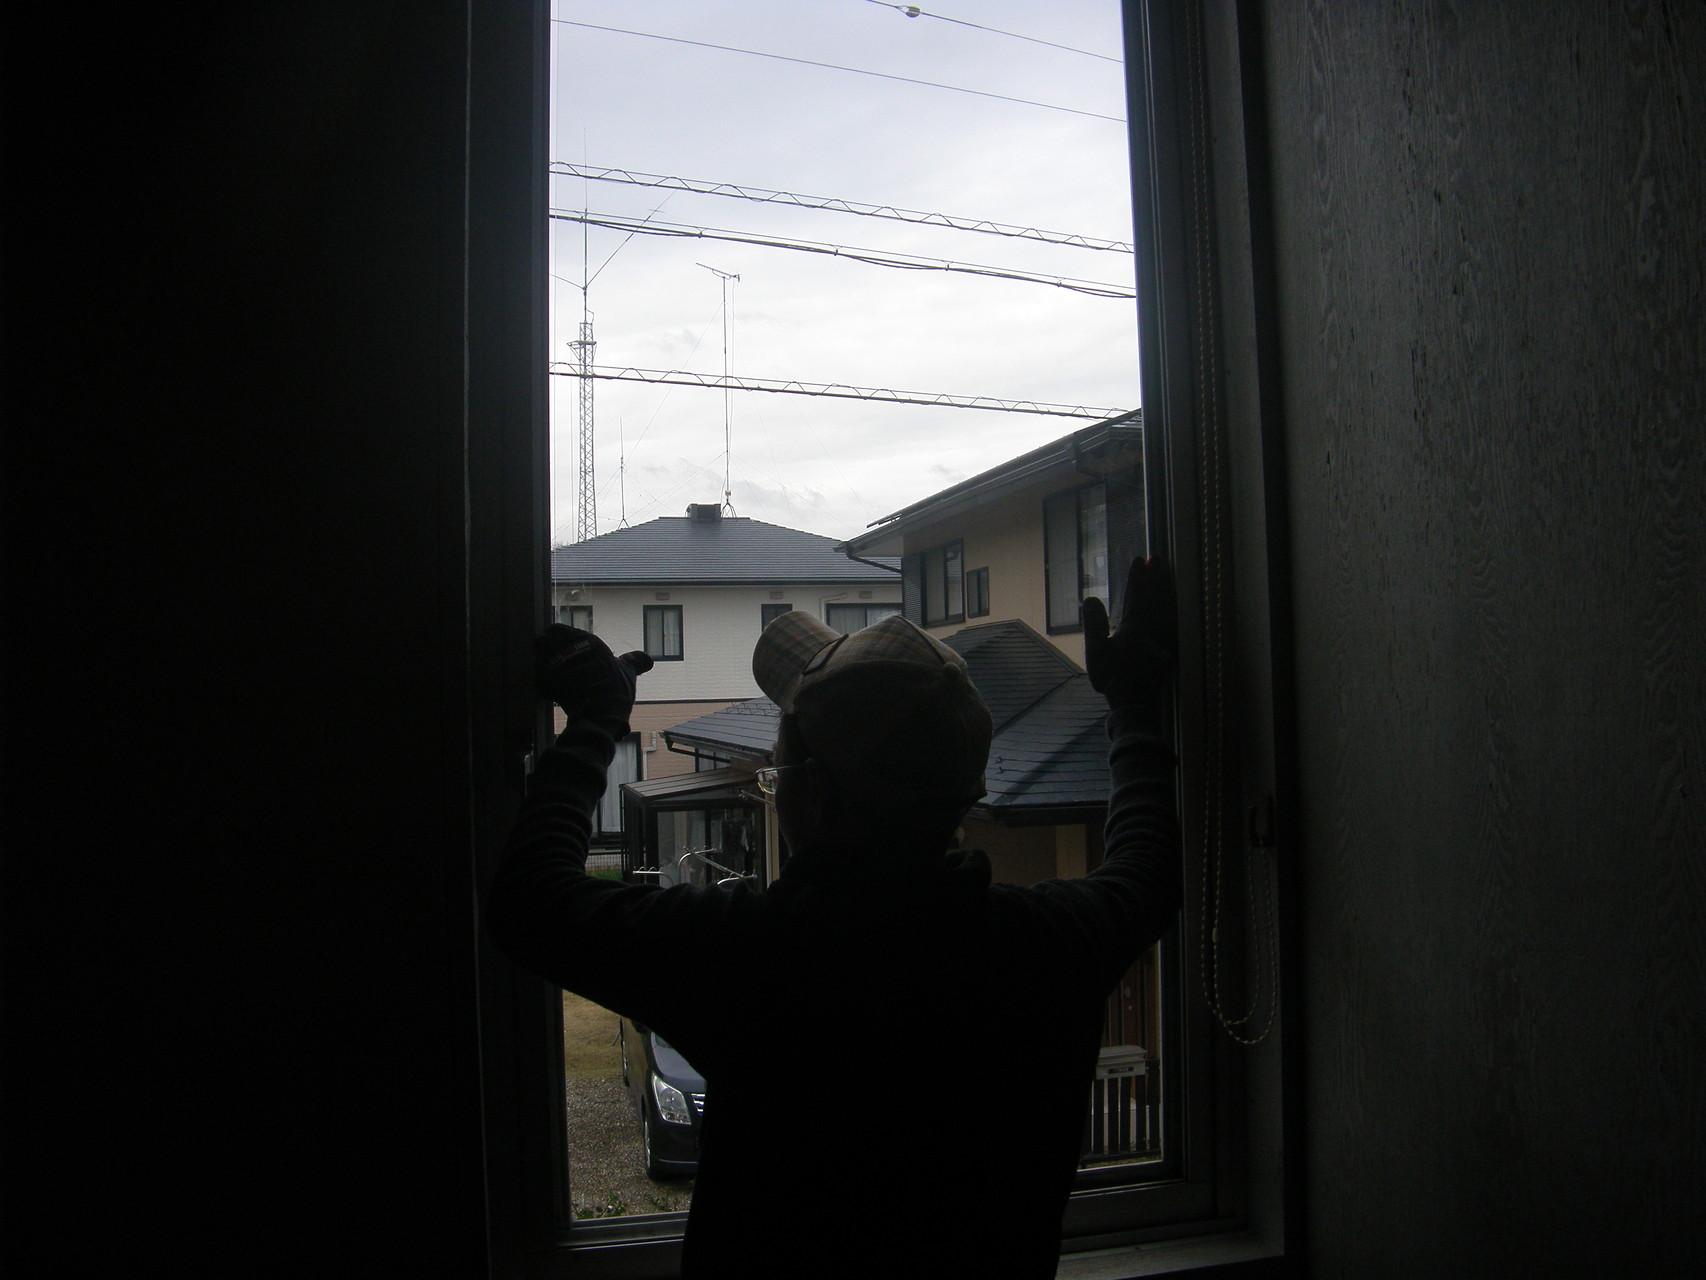 事務所窓ガラス修理:工程写真